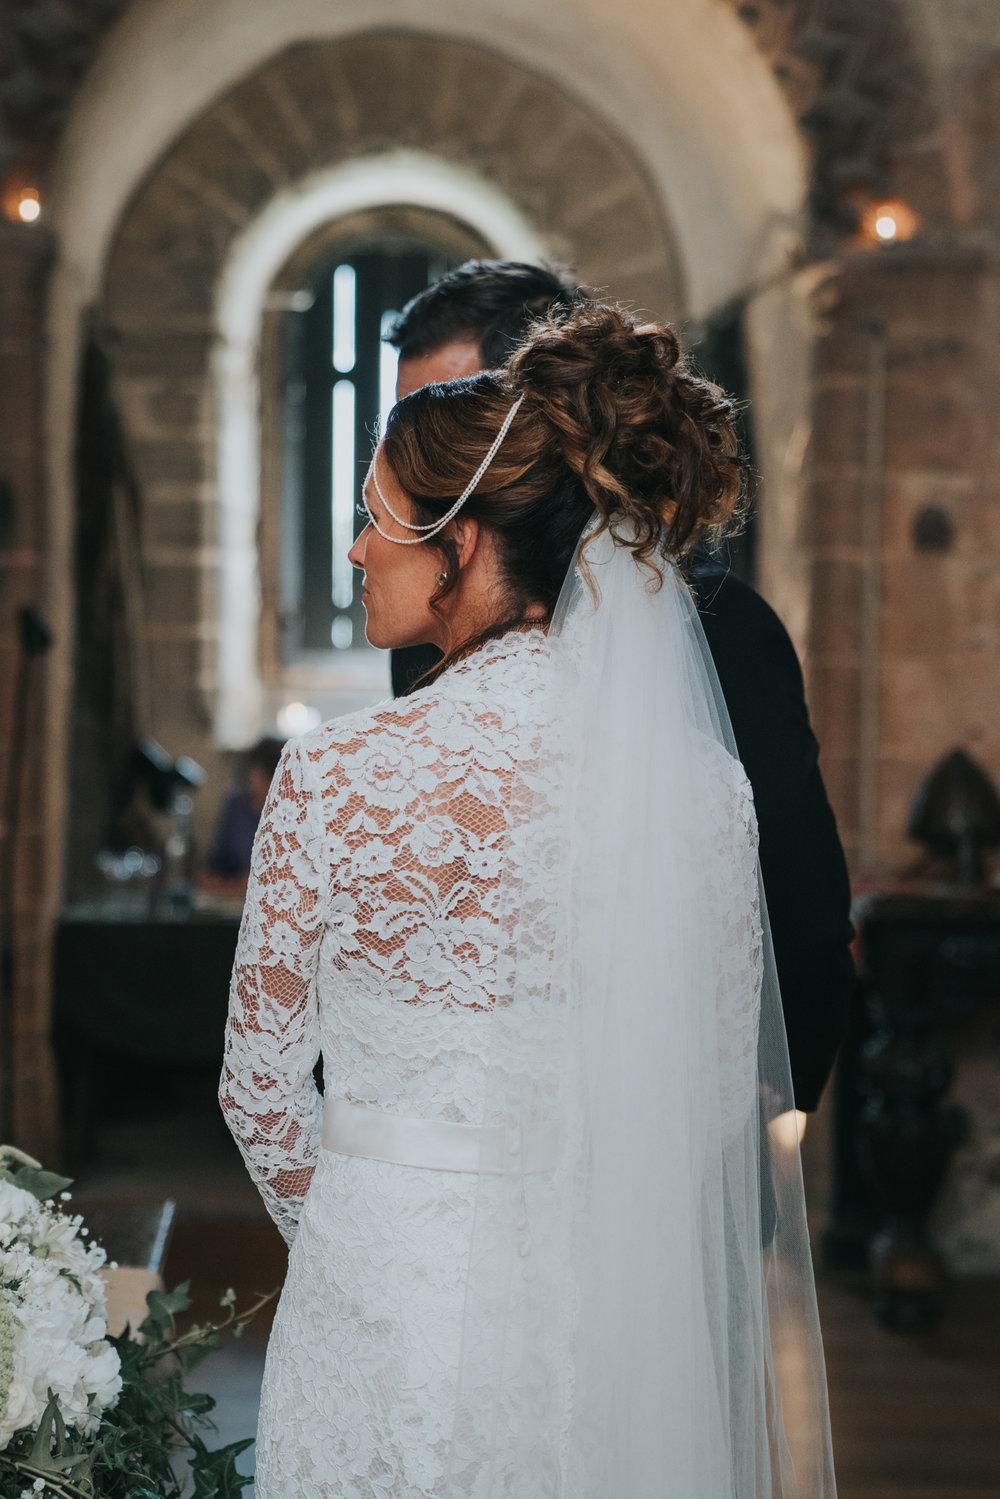 grace-elizabeth-boho-wedding-headingham-castle-essex-wedding-photographer-34.jpg